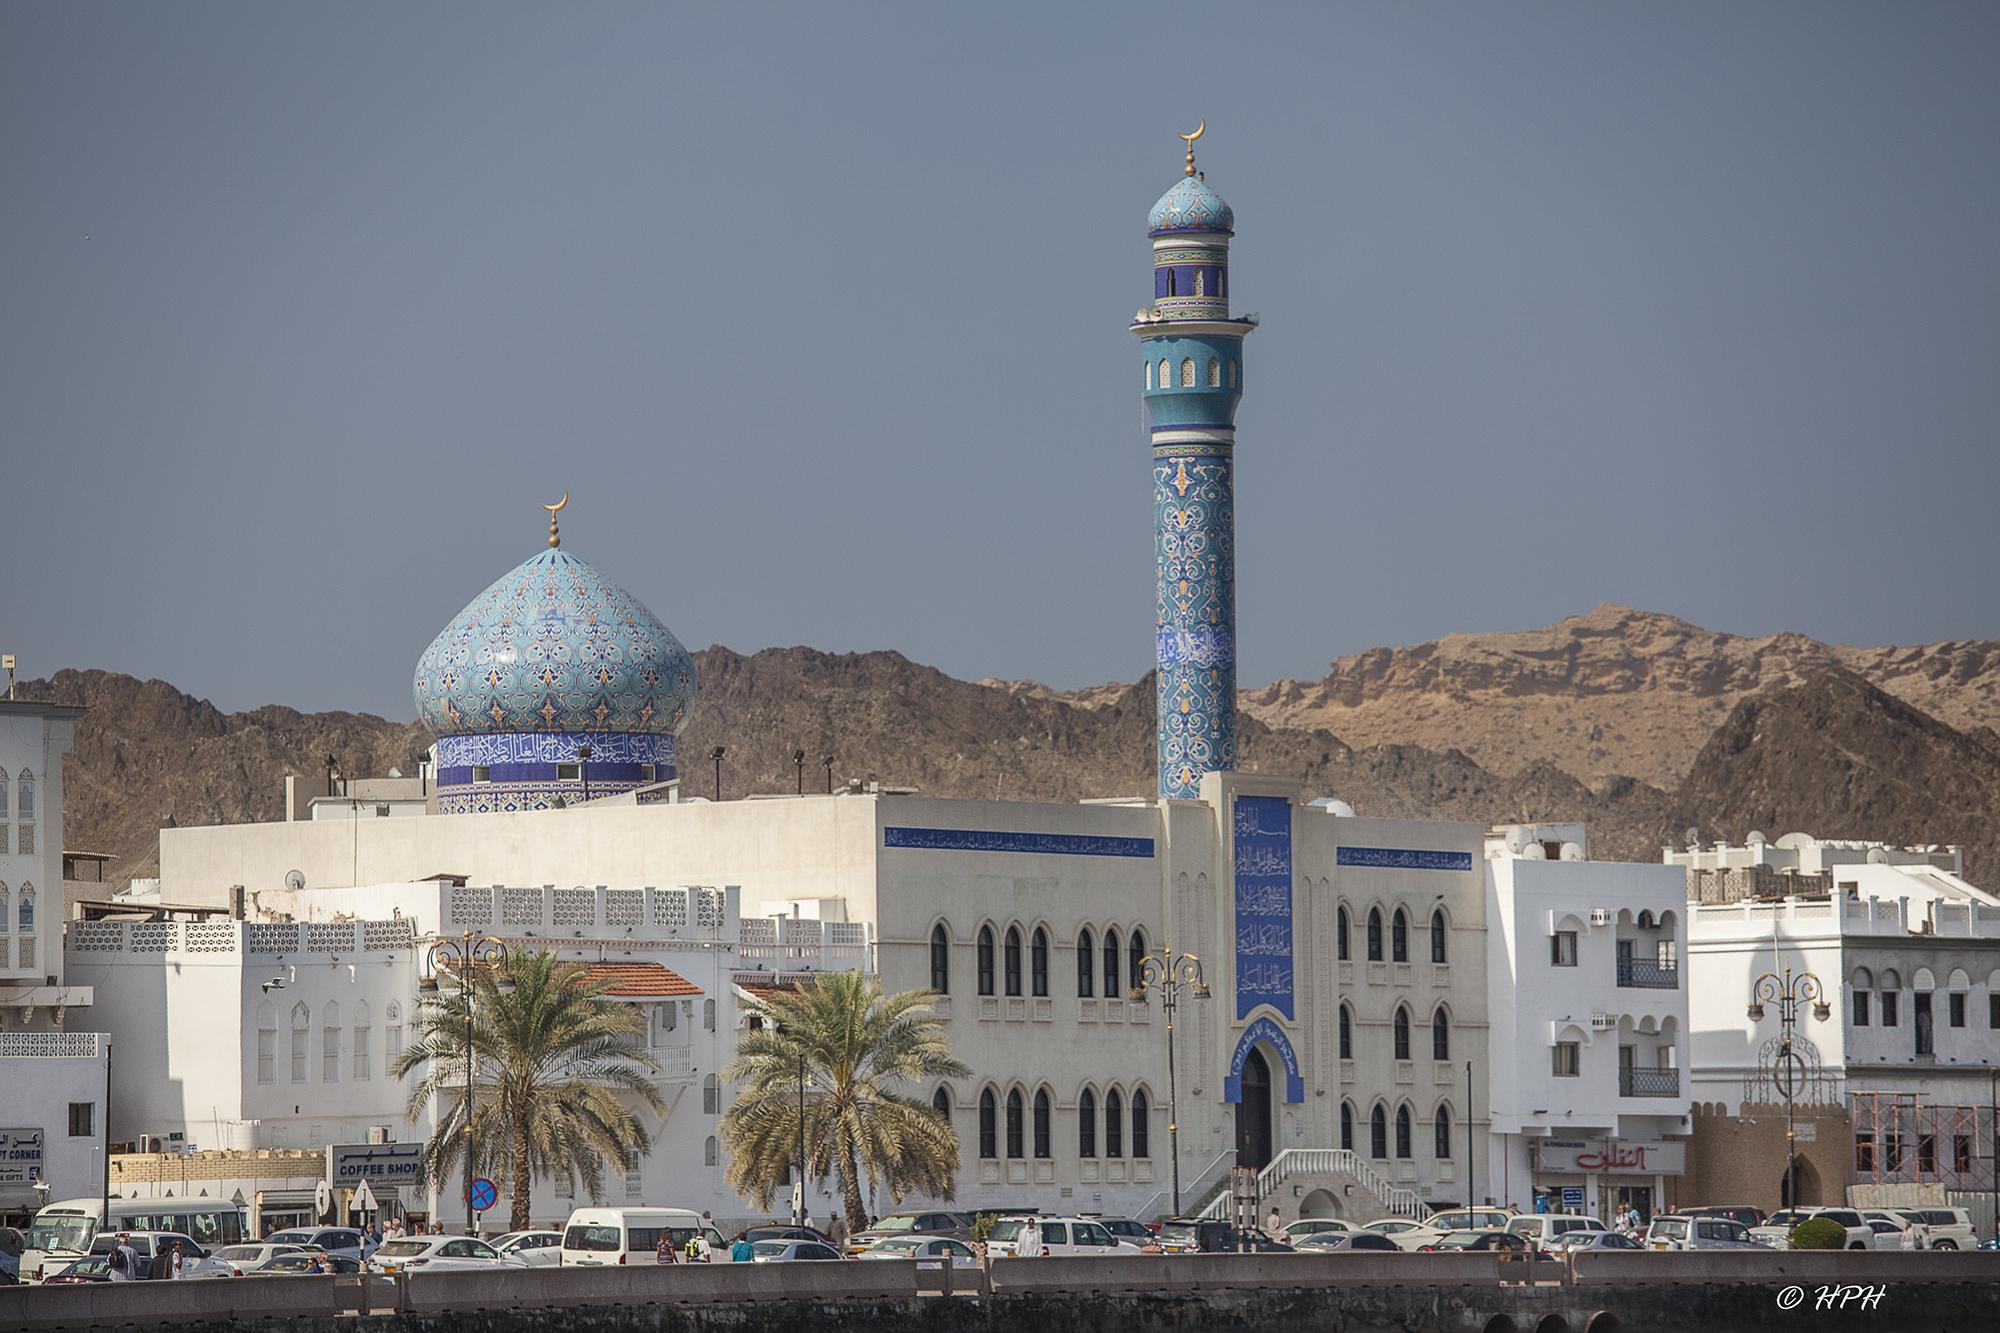 Corniche Mutrah, Oman